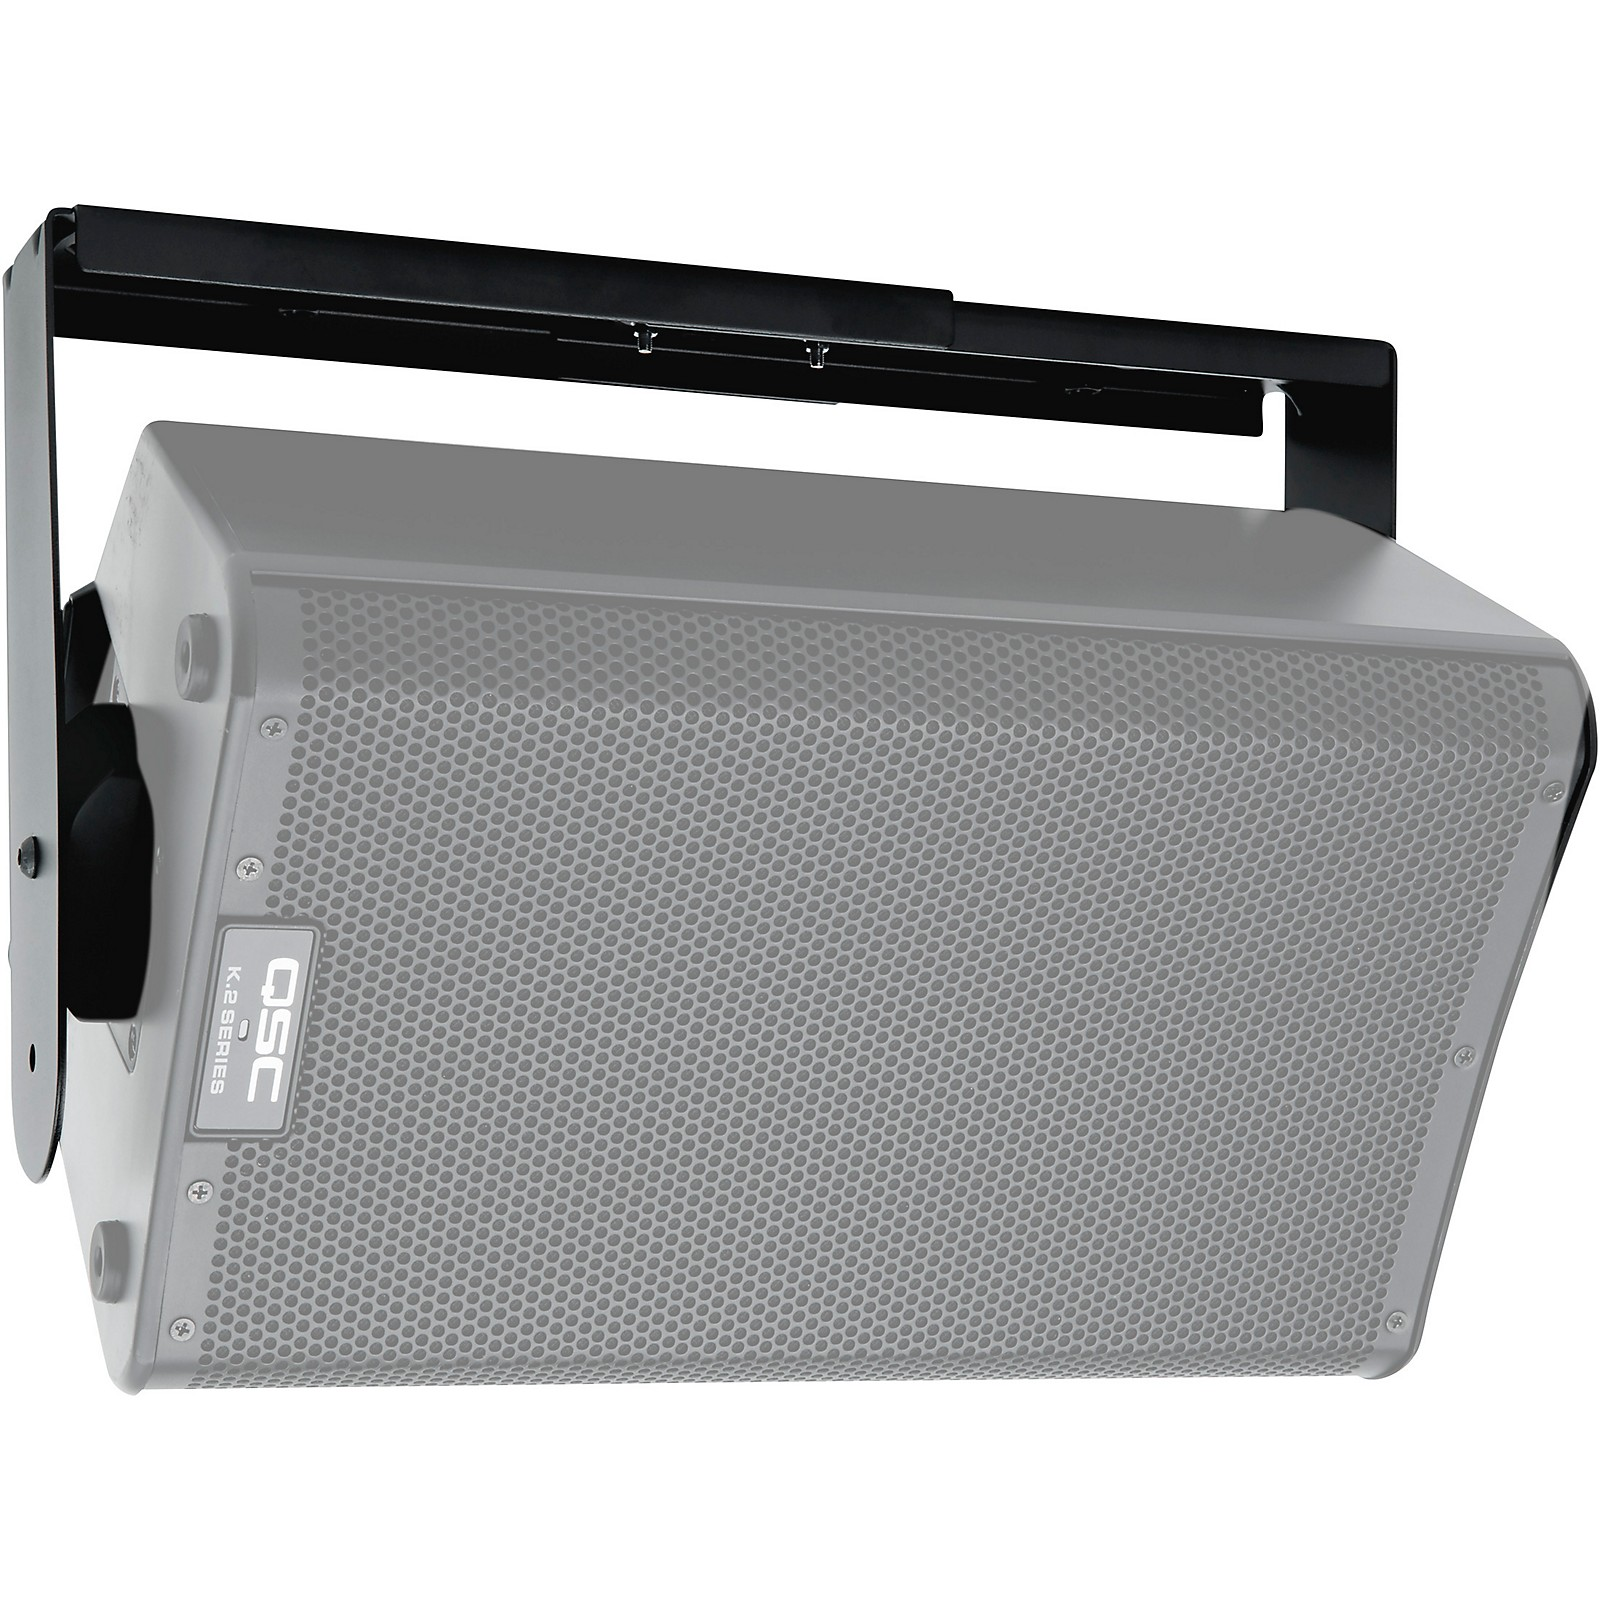 Open Box QSC K8.2 Powered Speaker Yoke Mount